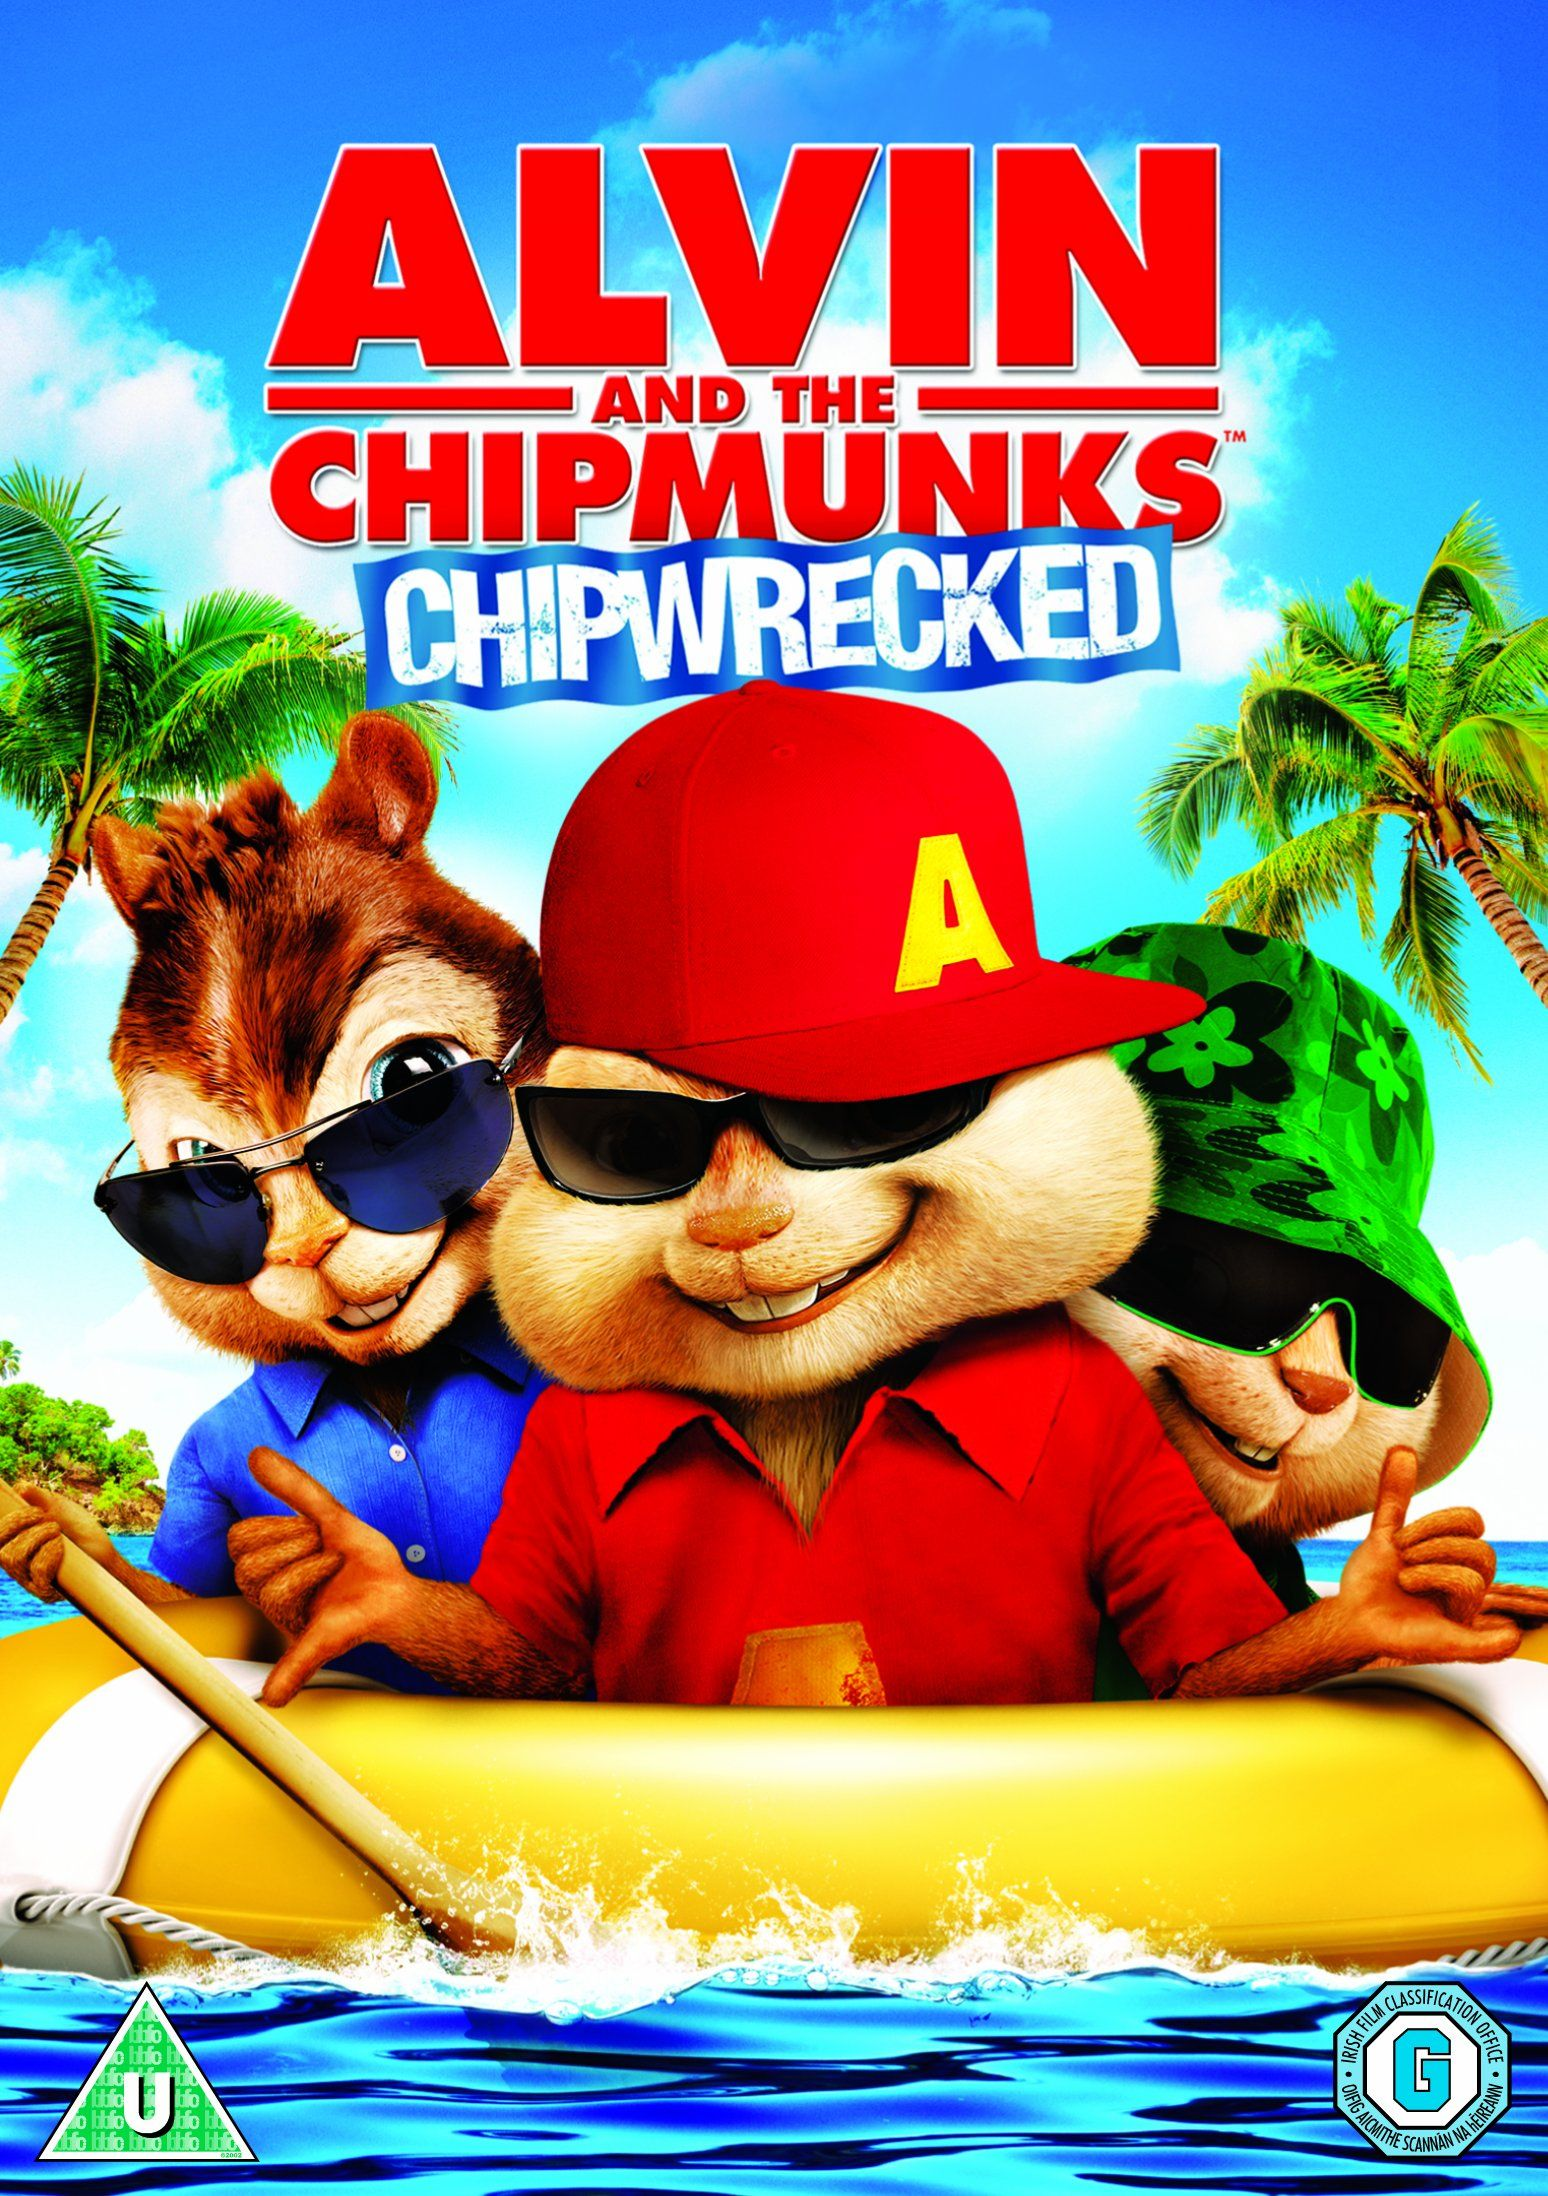 alvin and the chipmunks chipwrecked full movie online free putlocker